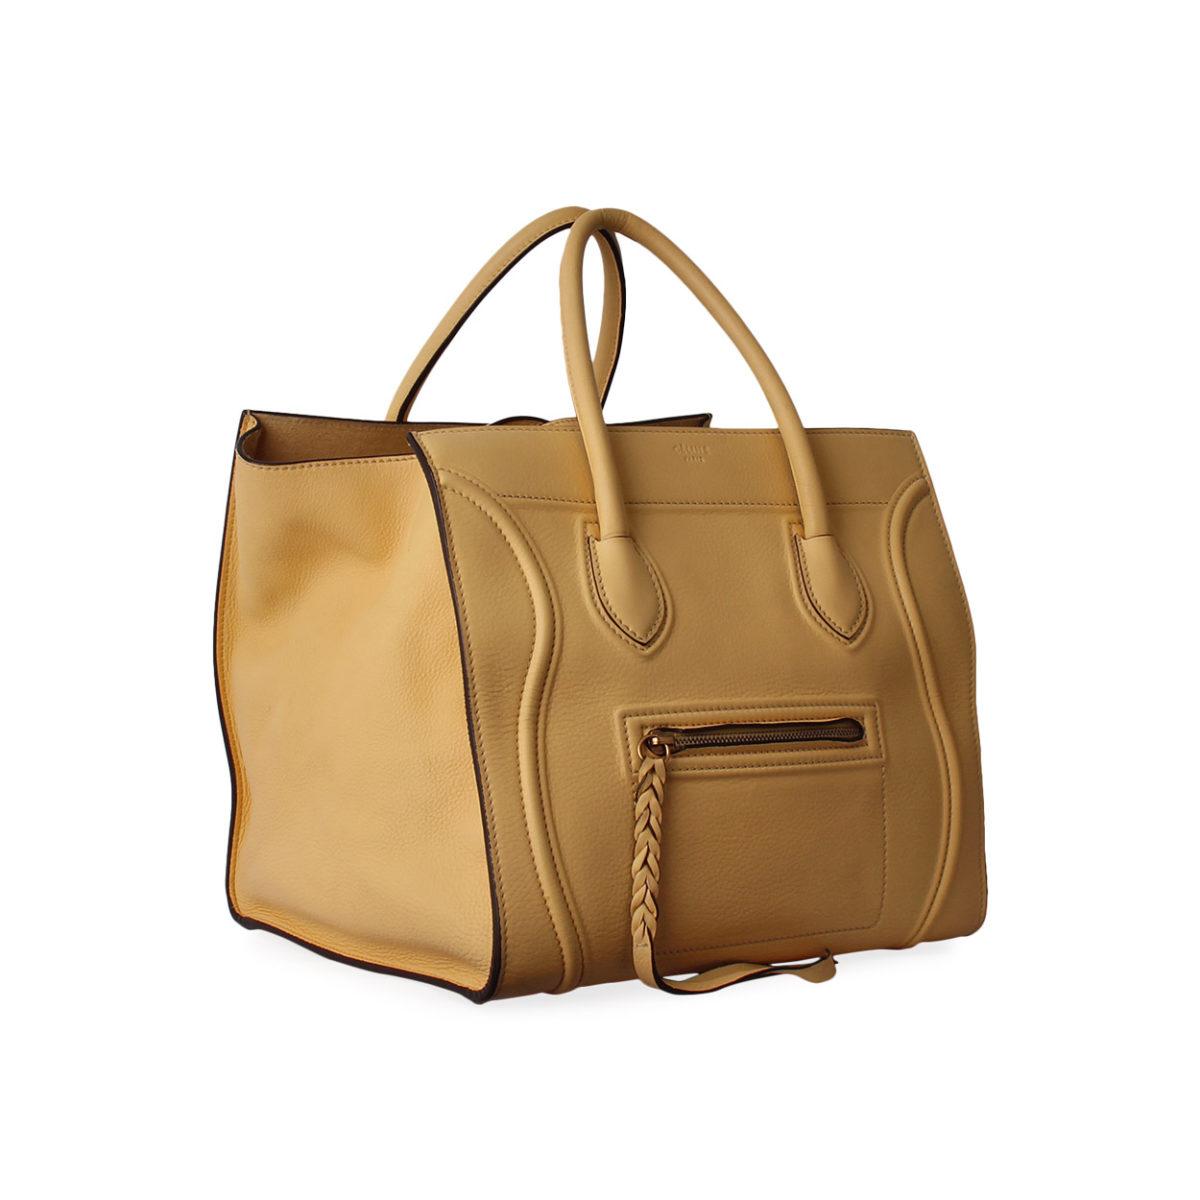 475ba86369 CELINE Calfskin Medium Phantom Luggage Tote Yellow